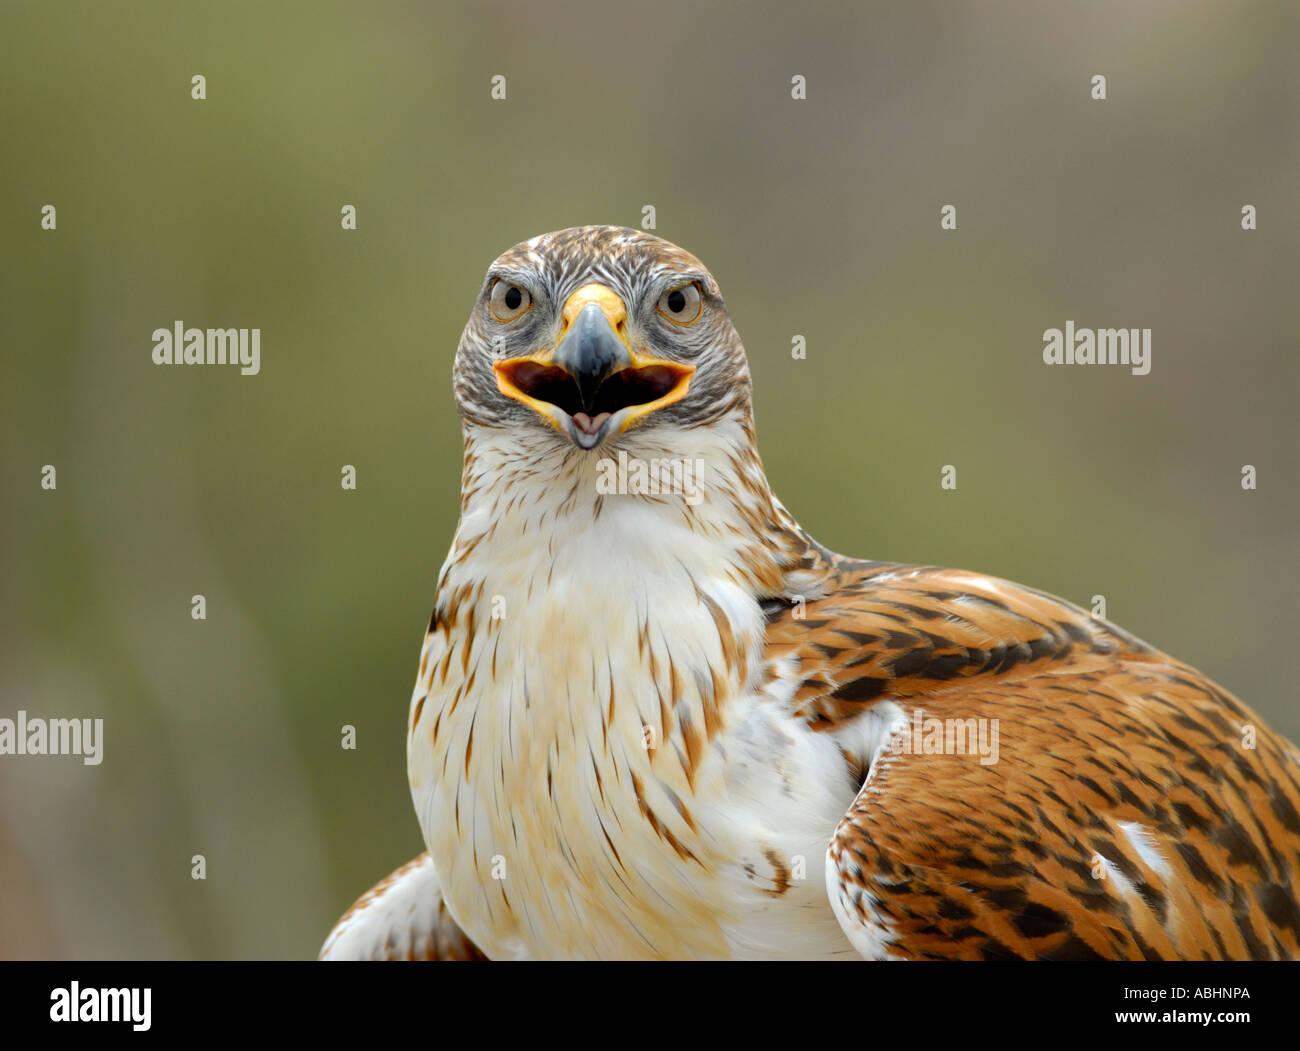 Ferruginous hawk, Buteo regalis, close-up of body and head looking at camera - Stock Image